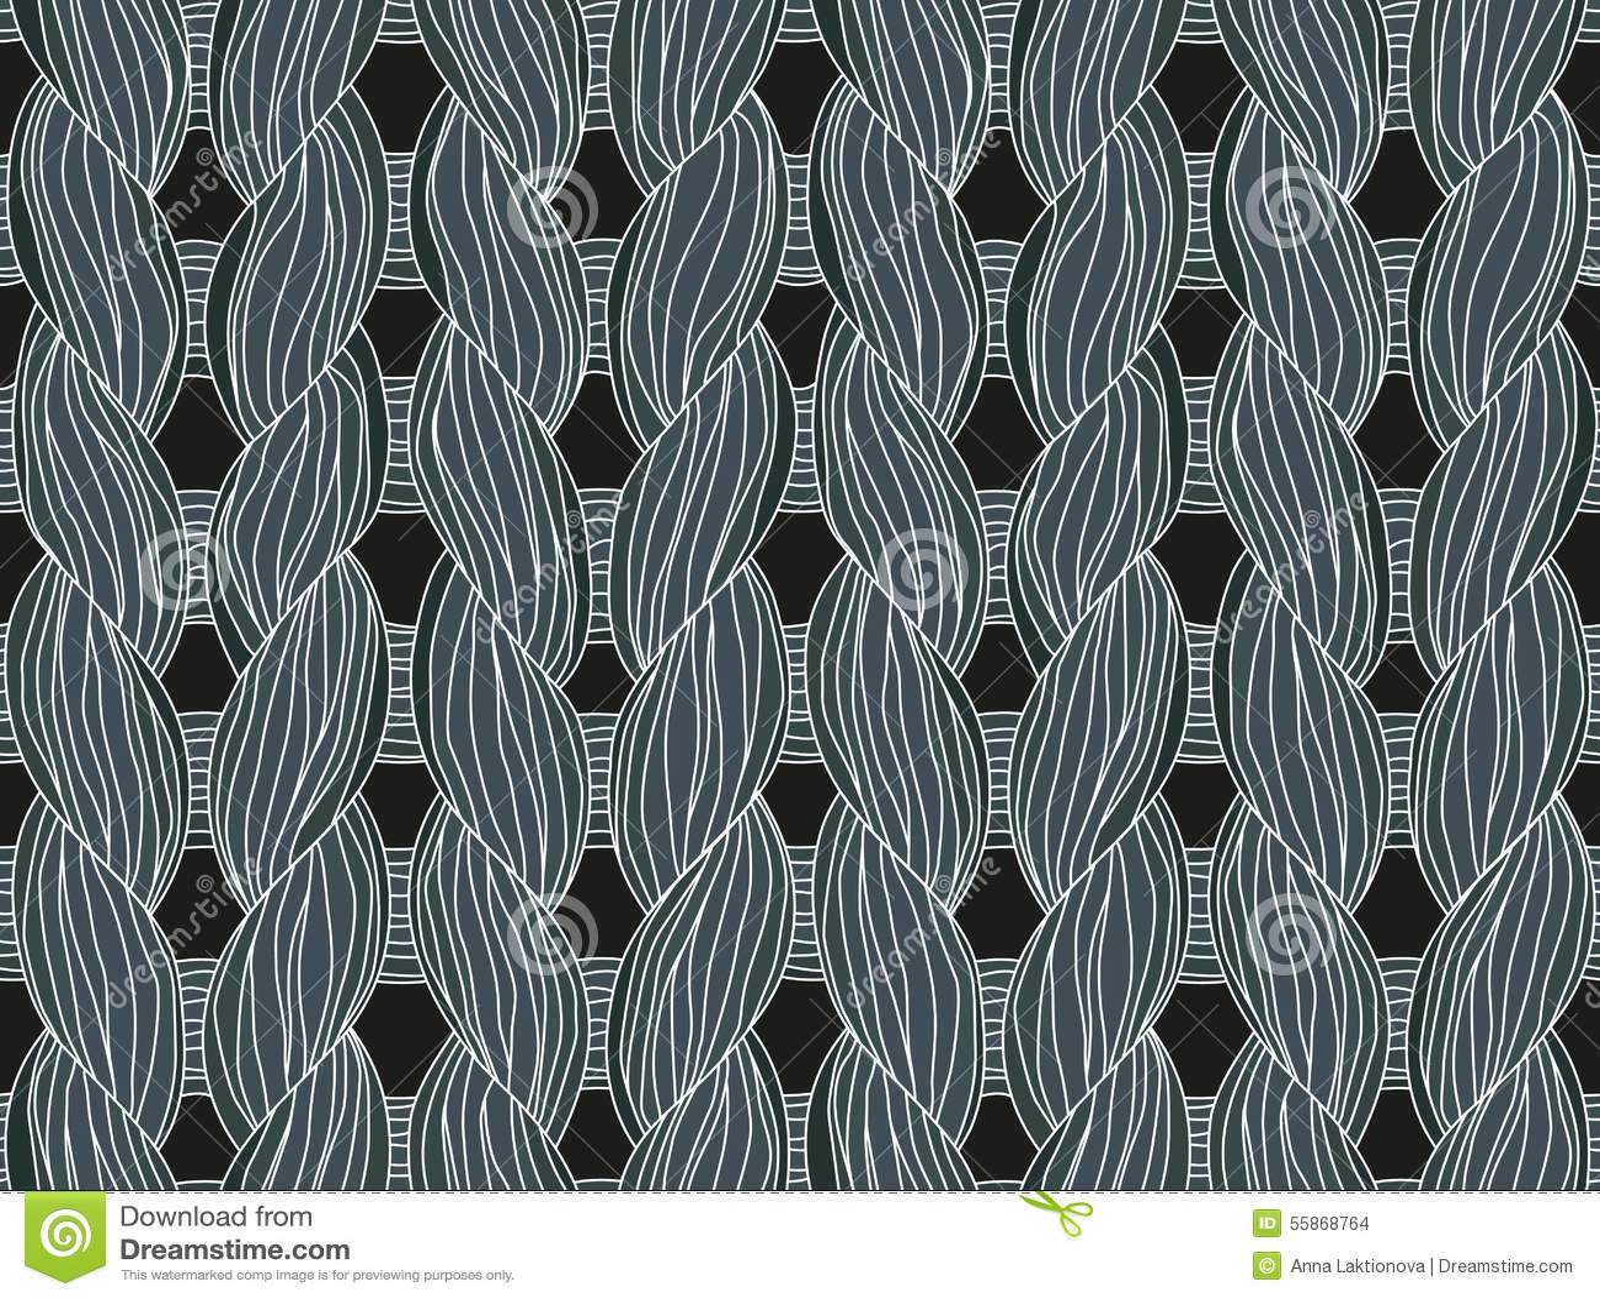 73142ecb0 Knitting close-up stock vector. Illustration of interweaving - 55868764